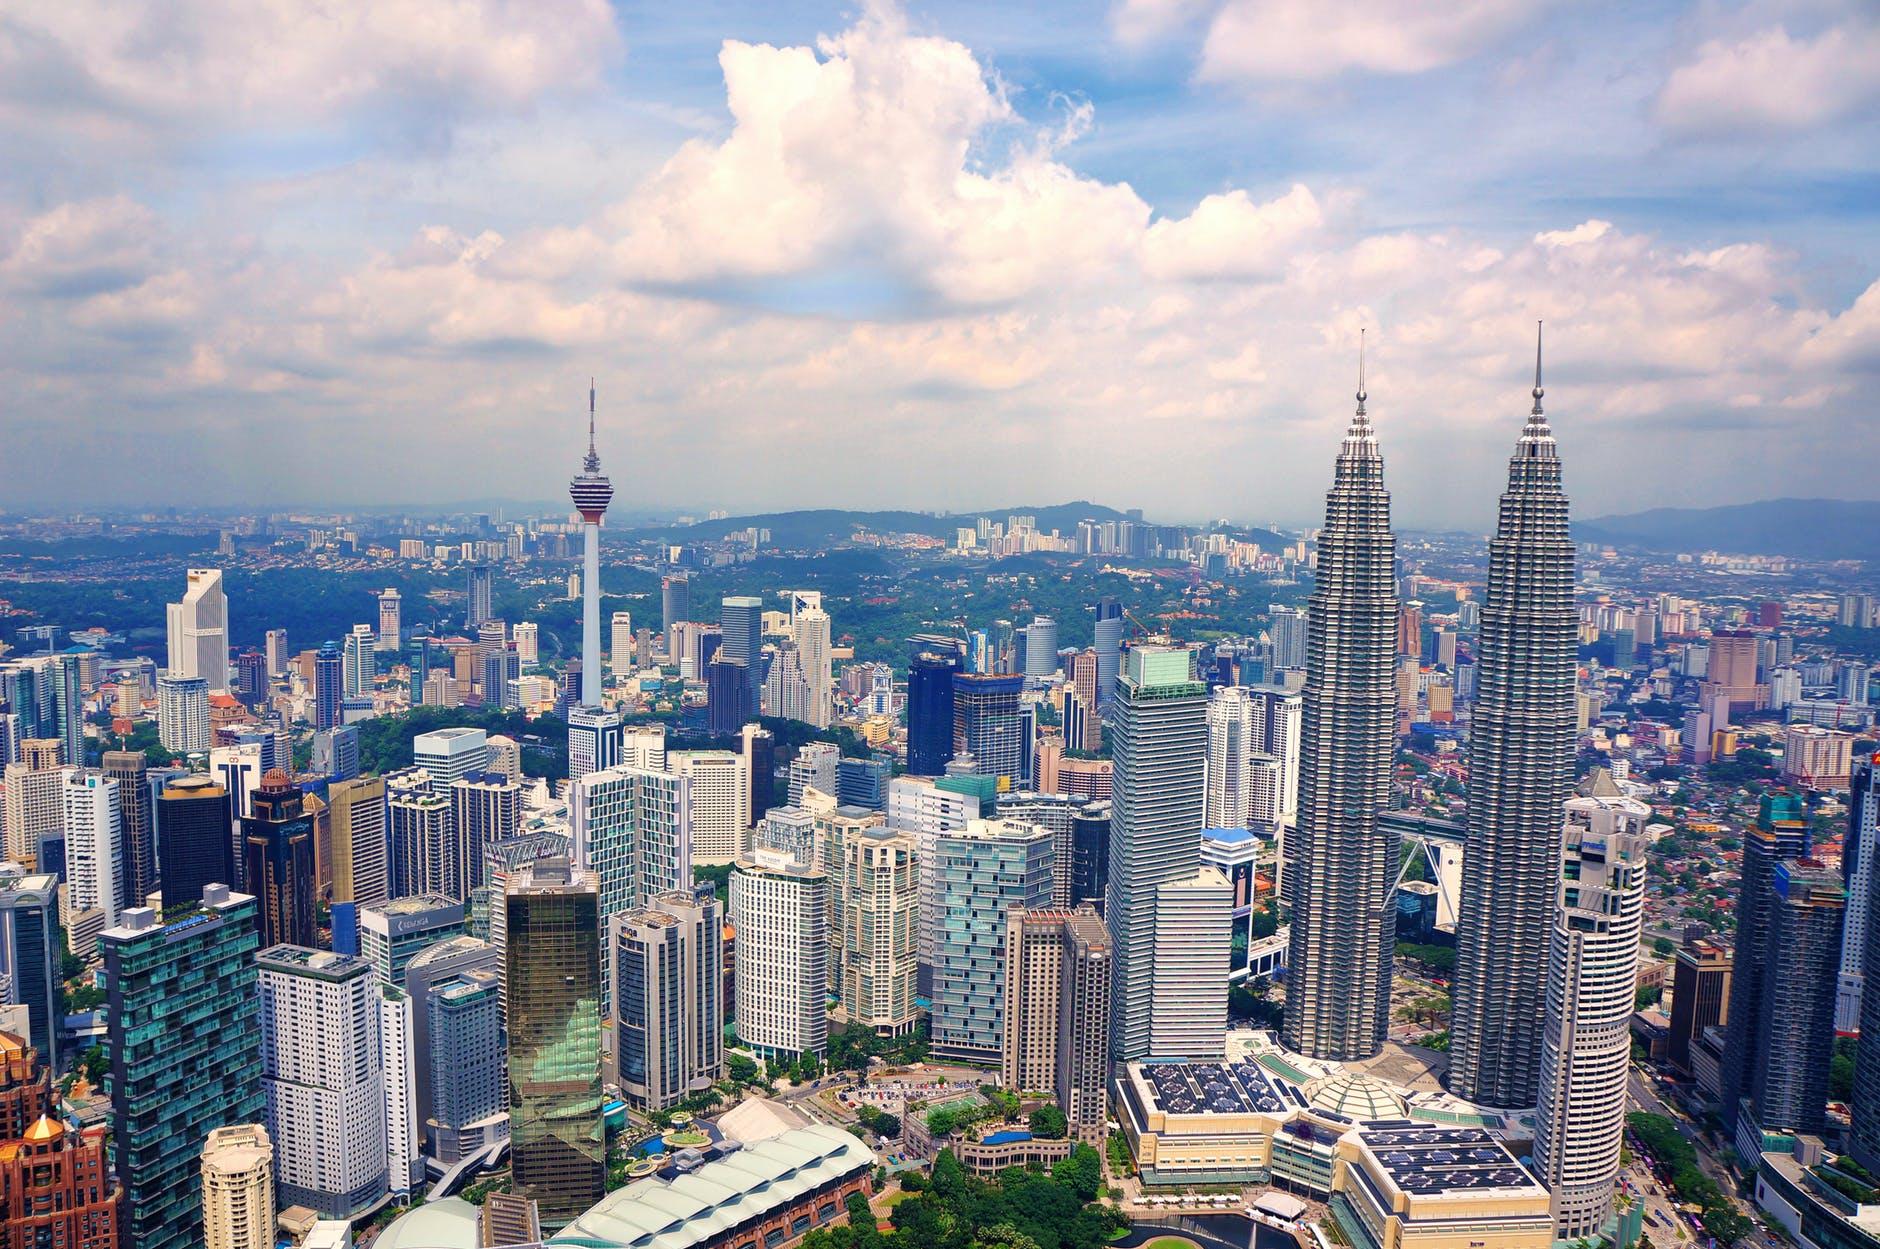 Malaysia INTERNATIONAL HONEYMOON DESTINATIONS ROMANTIC VACATIONS ON A BUDGET